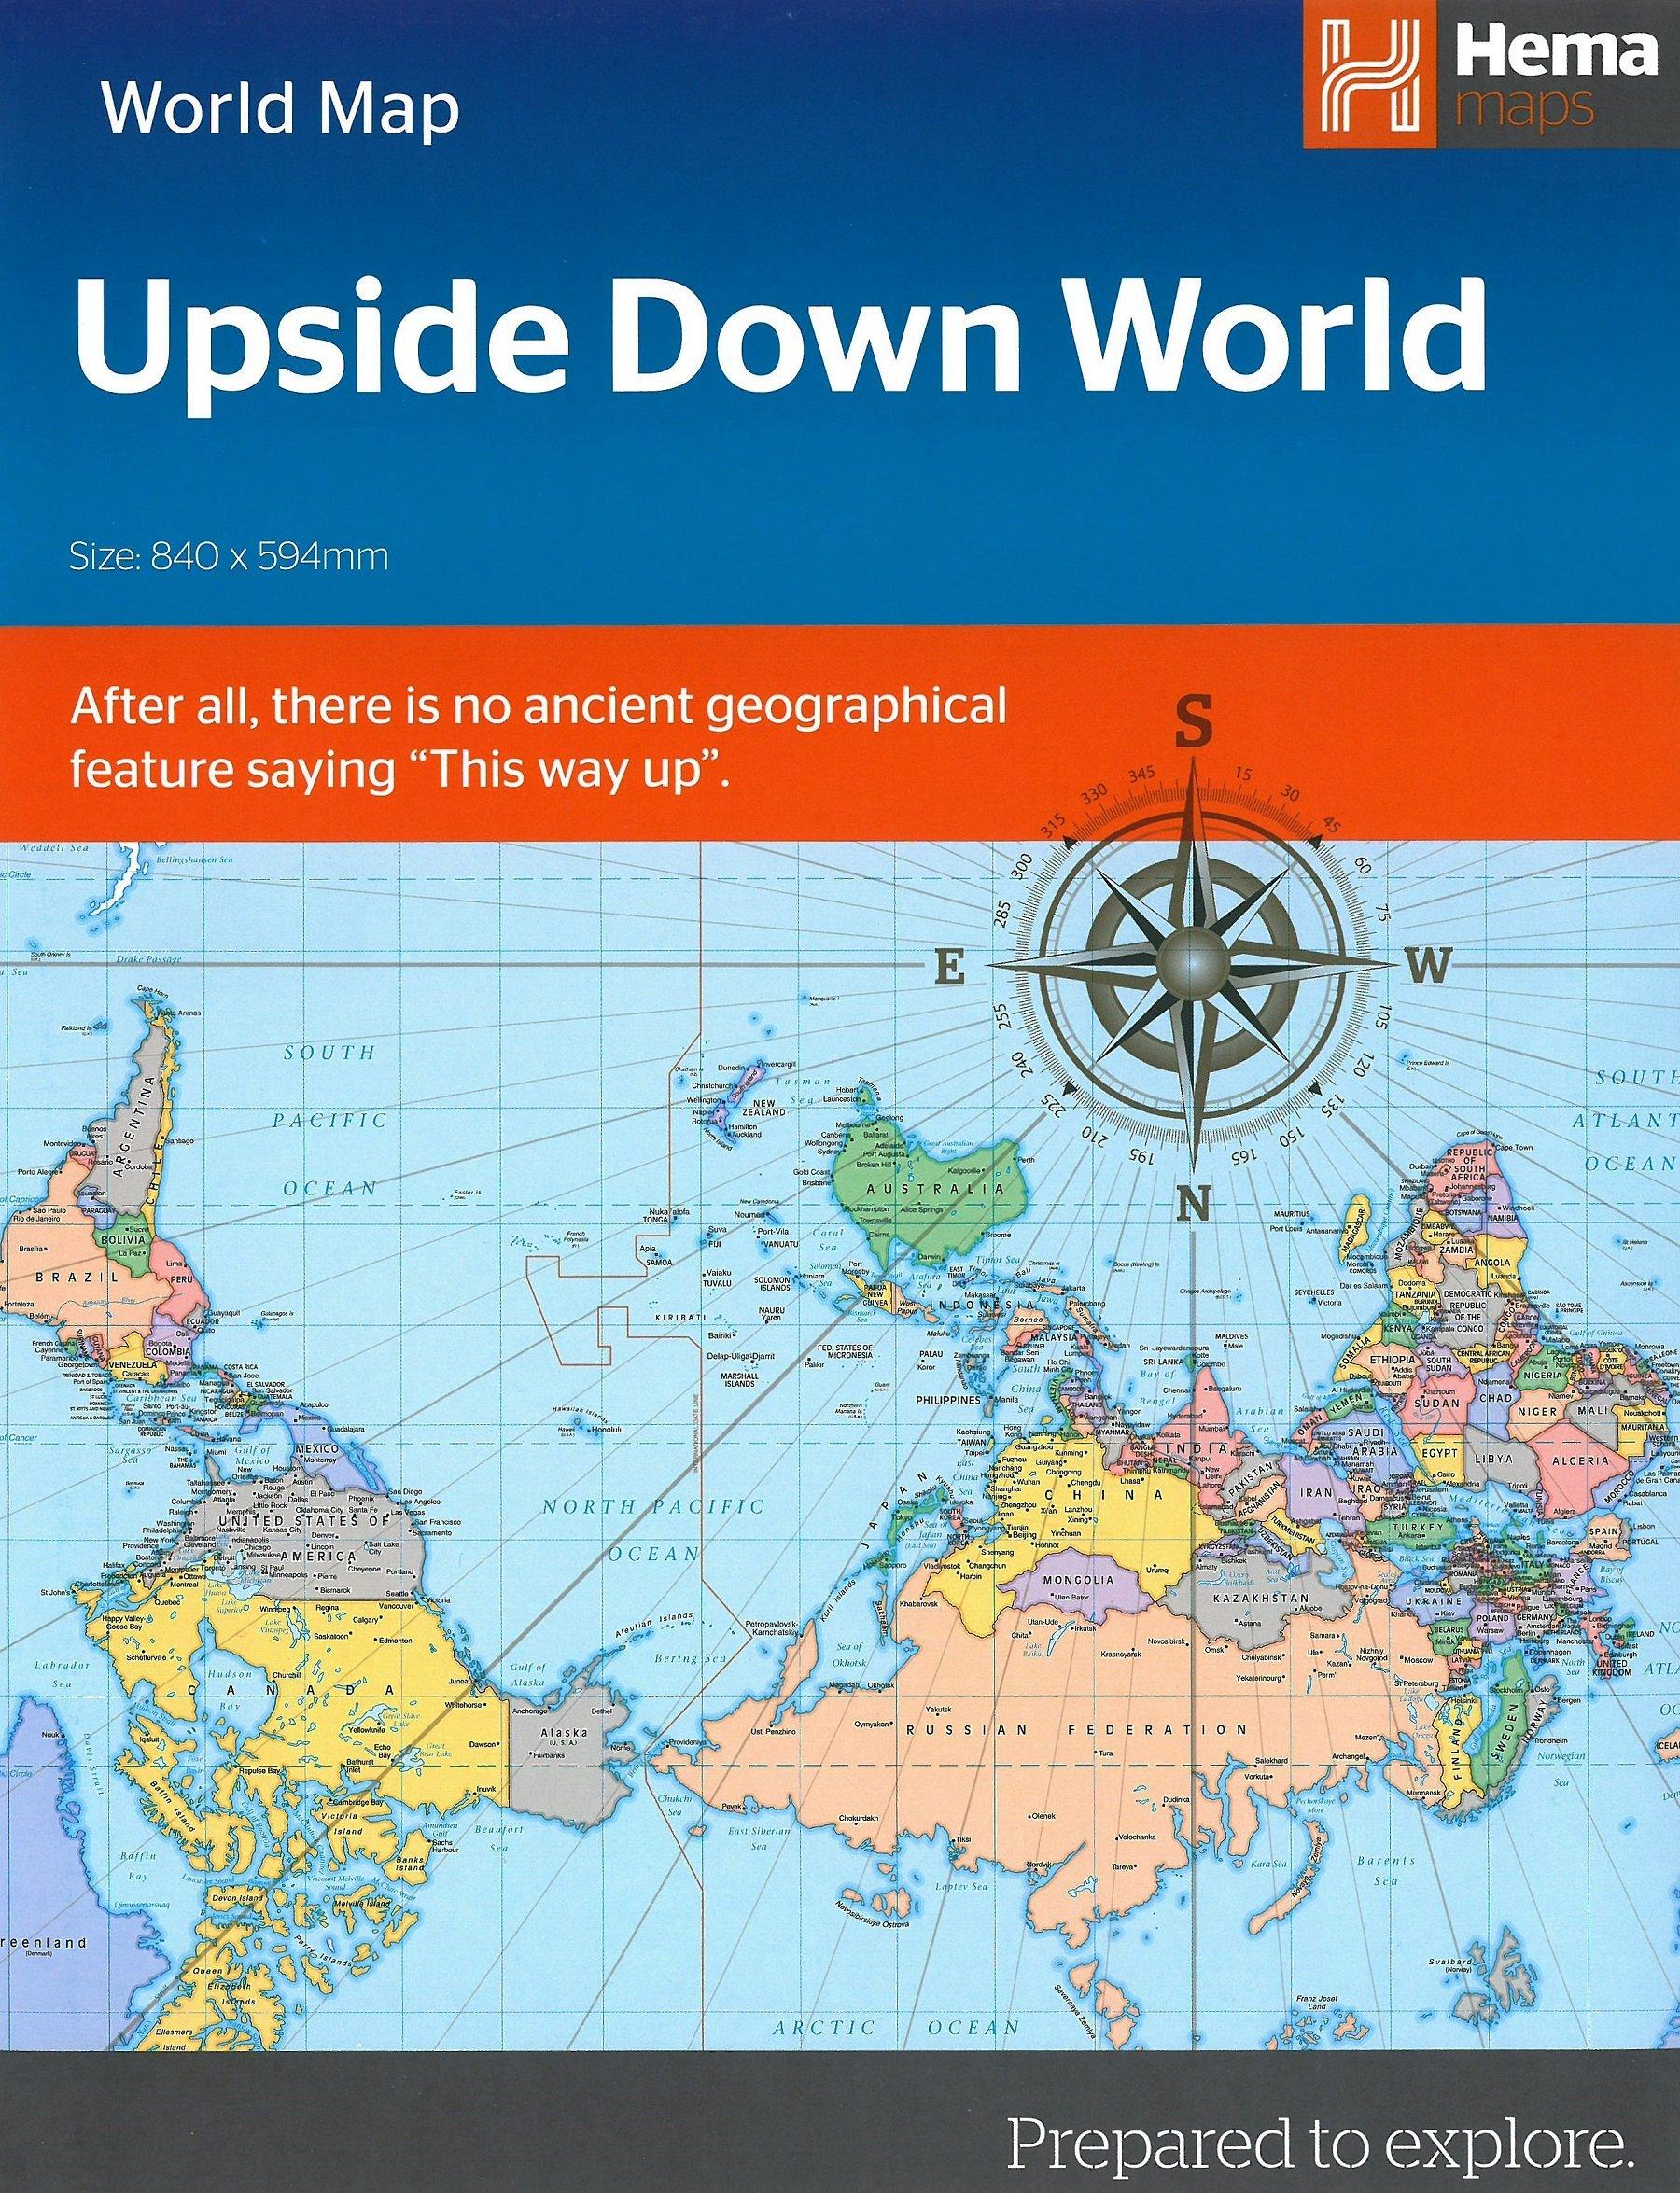 Upside Down World Map (Folded): Hema Maps: 9781925195118: Amazon.com ...